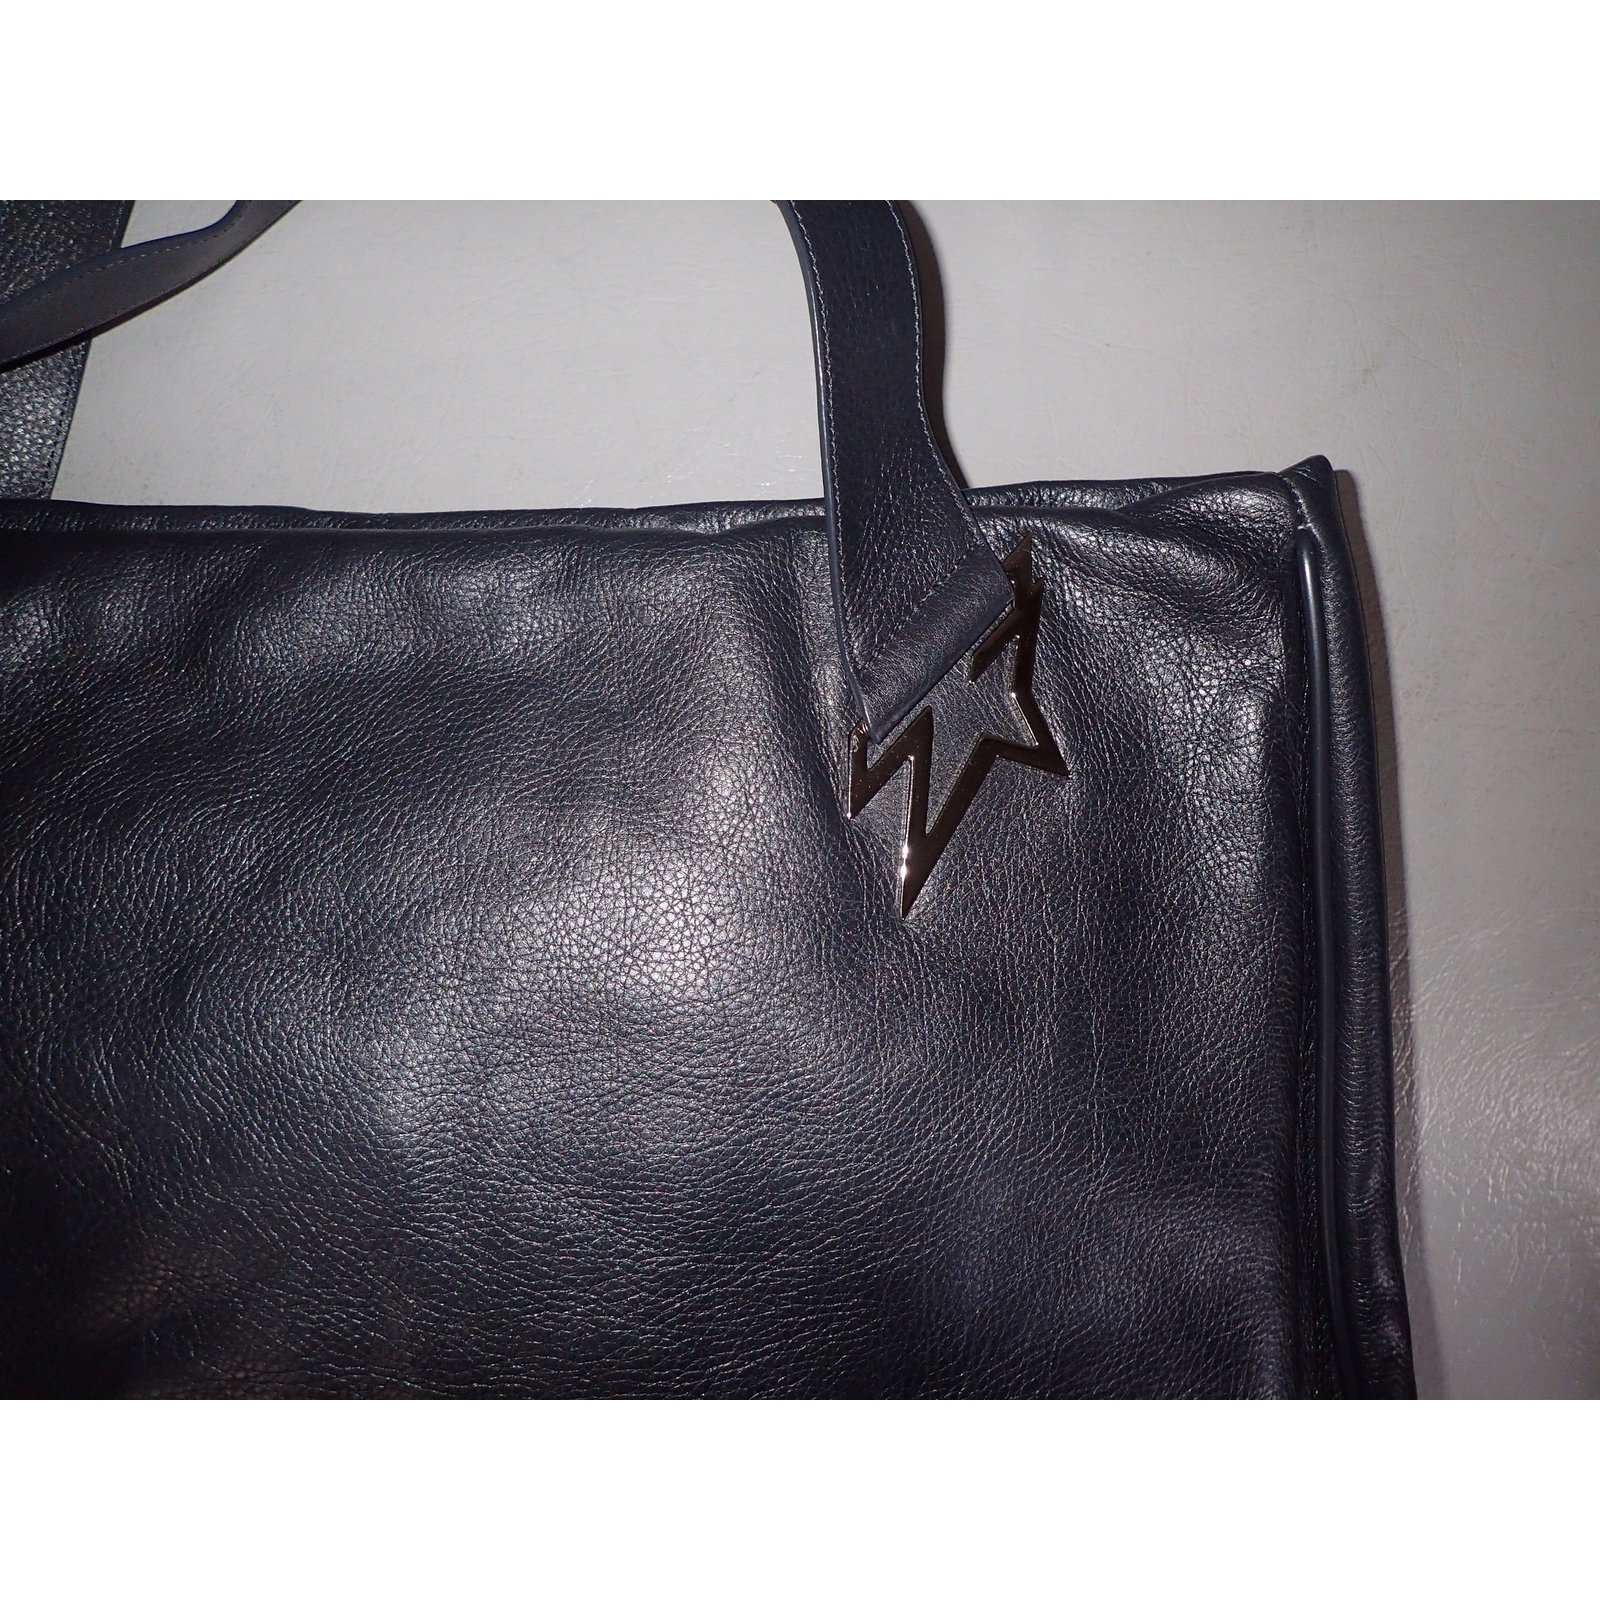 Thierry Mugler Travel Bag Leather Grey Ref 49341 Joli Closet